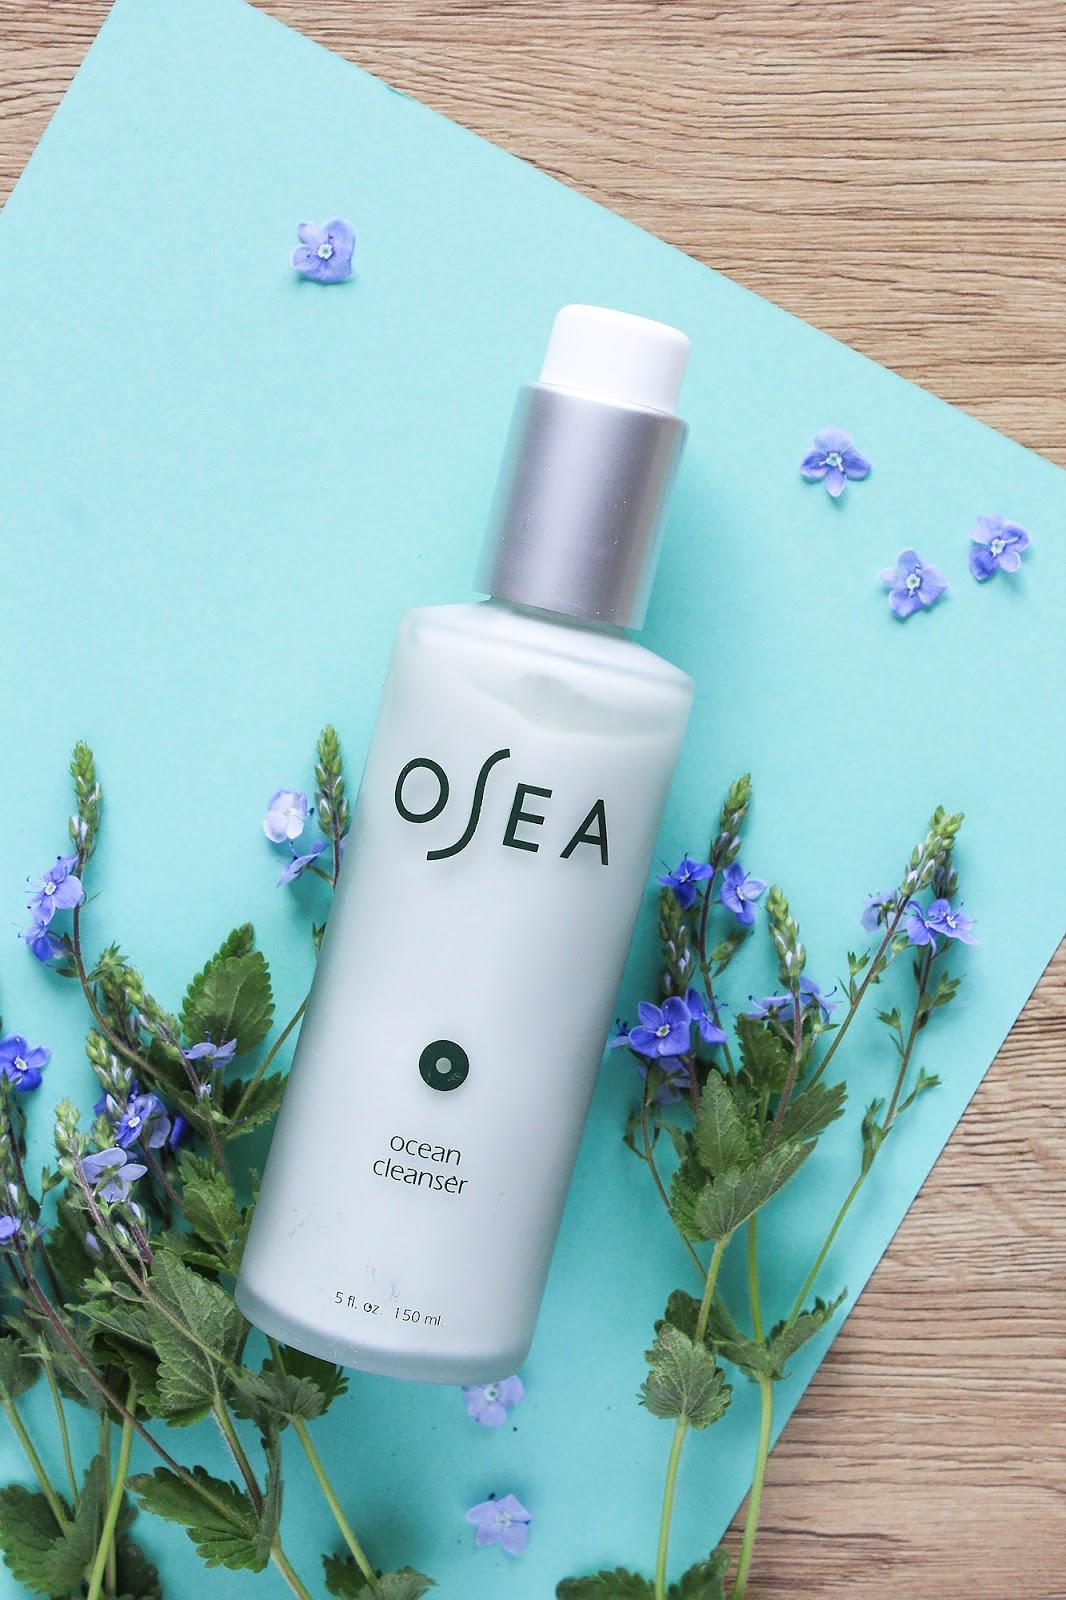 OSEA Ocean Cleanser Beauty Heroes Beauty Discovery May 2018. Vegan, gluten-free.